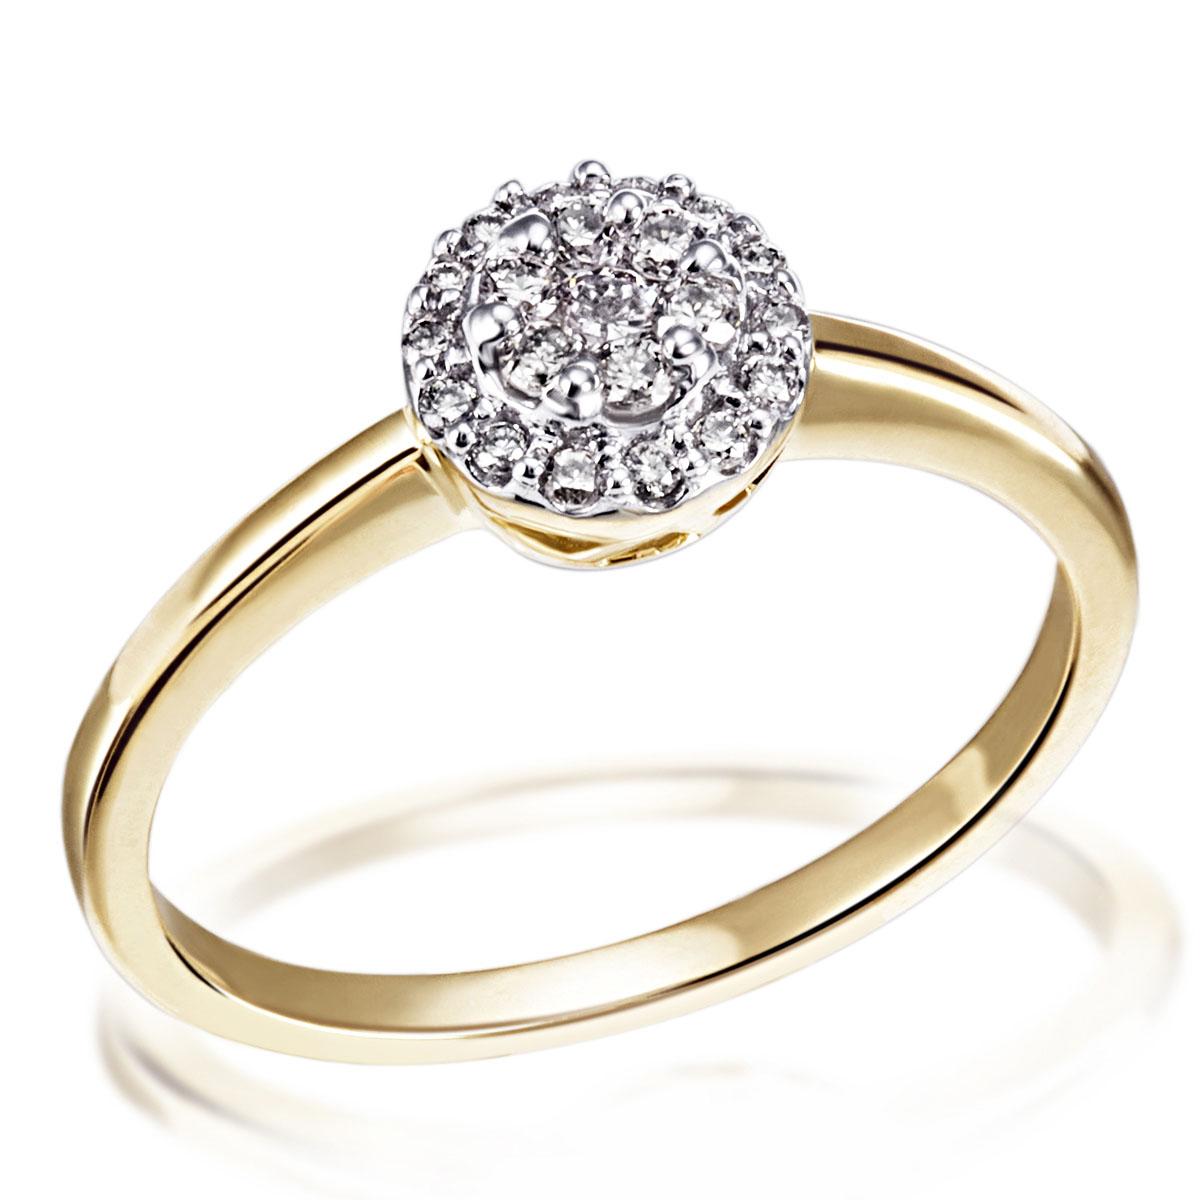 goldmaid ring kette und oder ohrringe 585 gelbgold glamour mit brillanten ebay. Black Bedroom Furniture Sets. Home Design Ideas